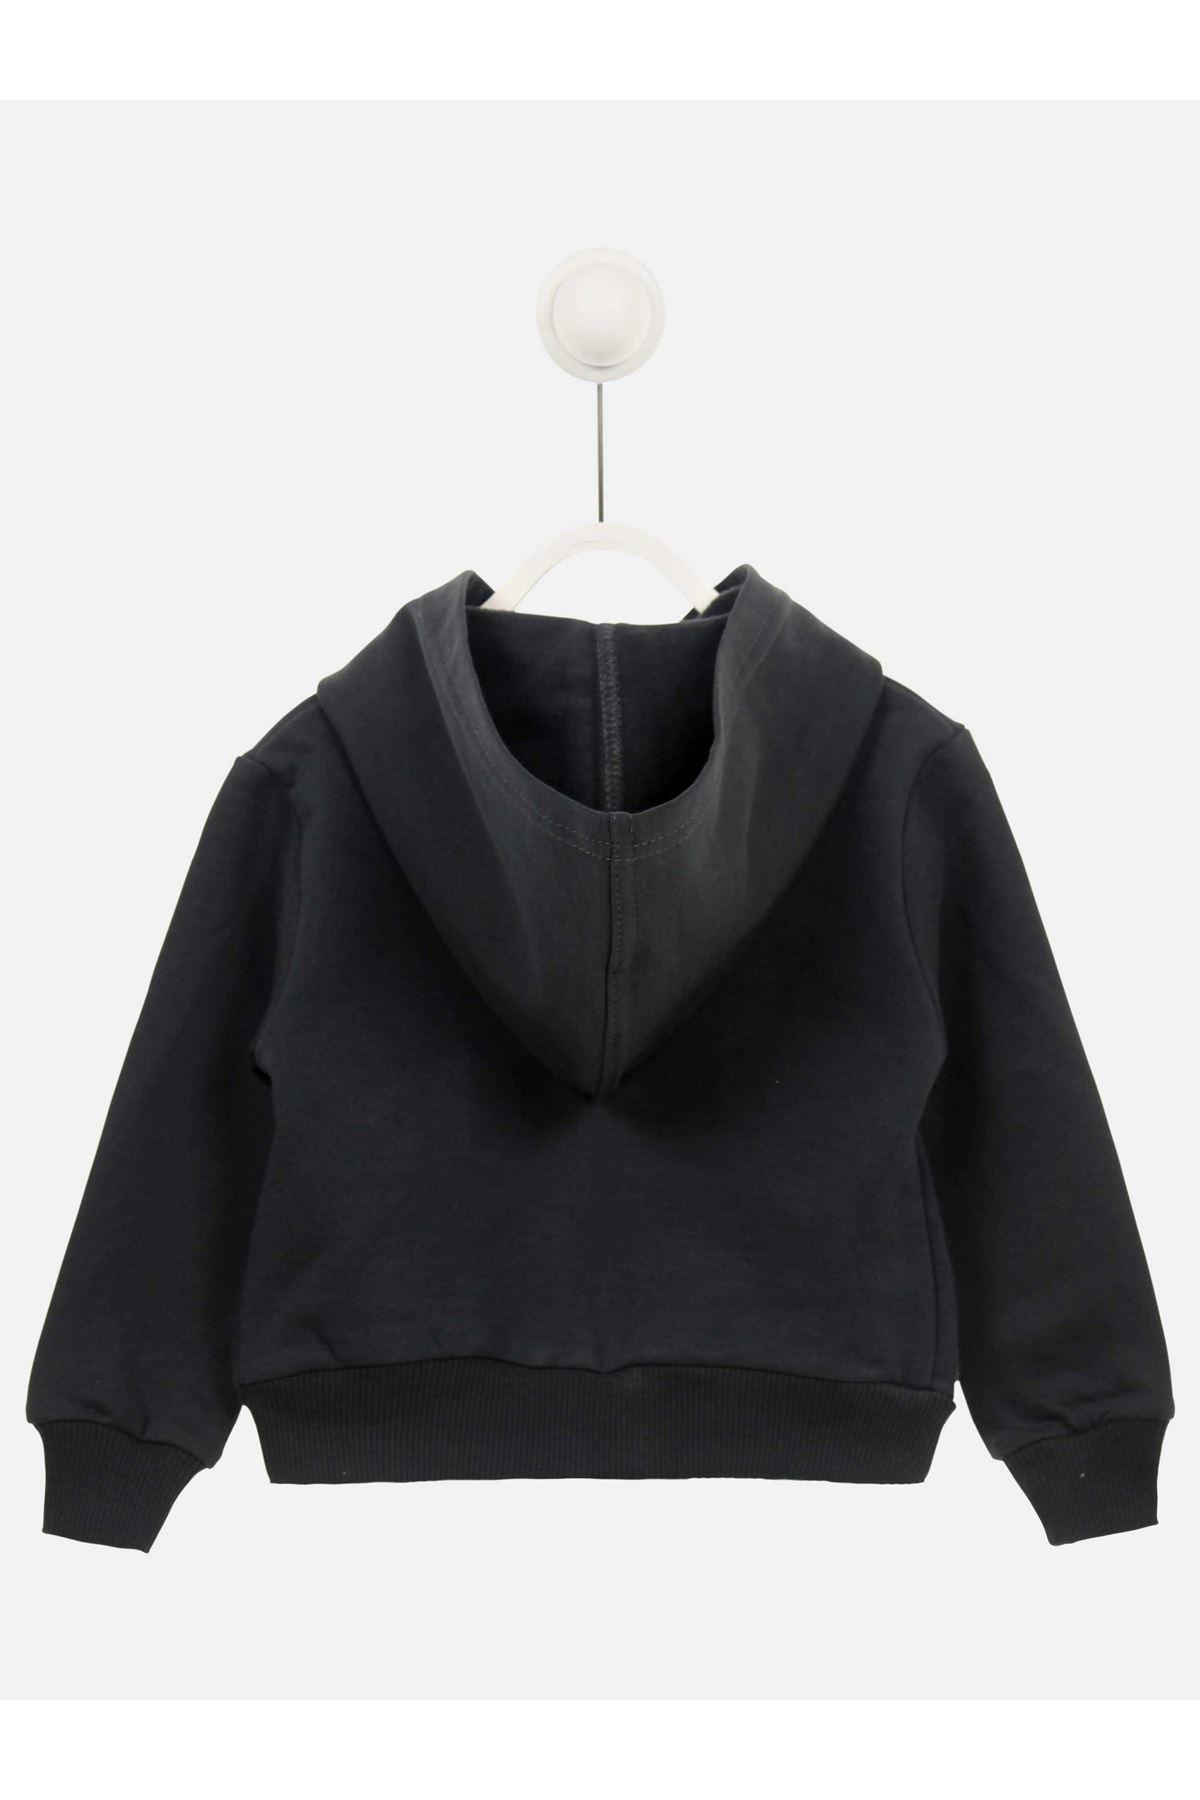 Smoked Seasonal Male Child Sweatshirt